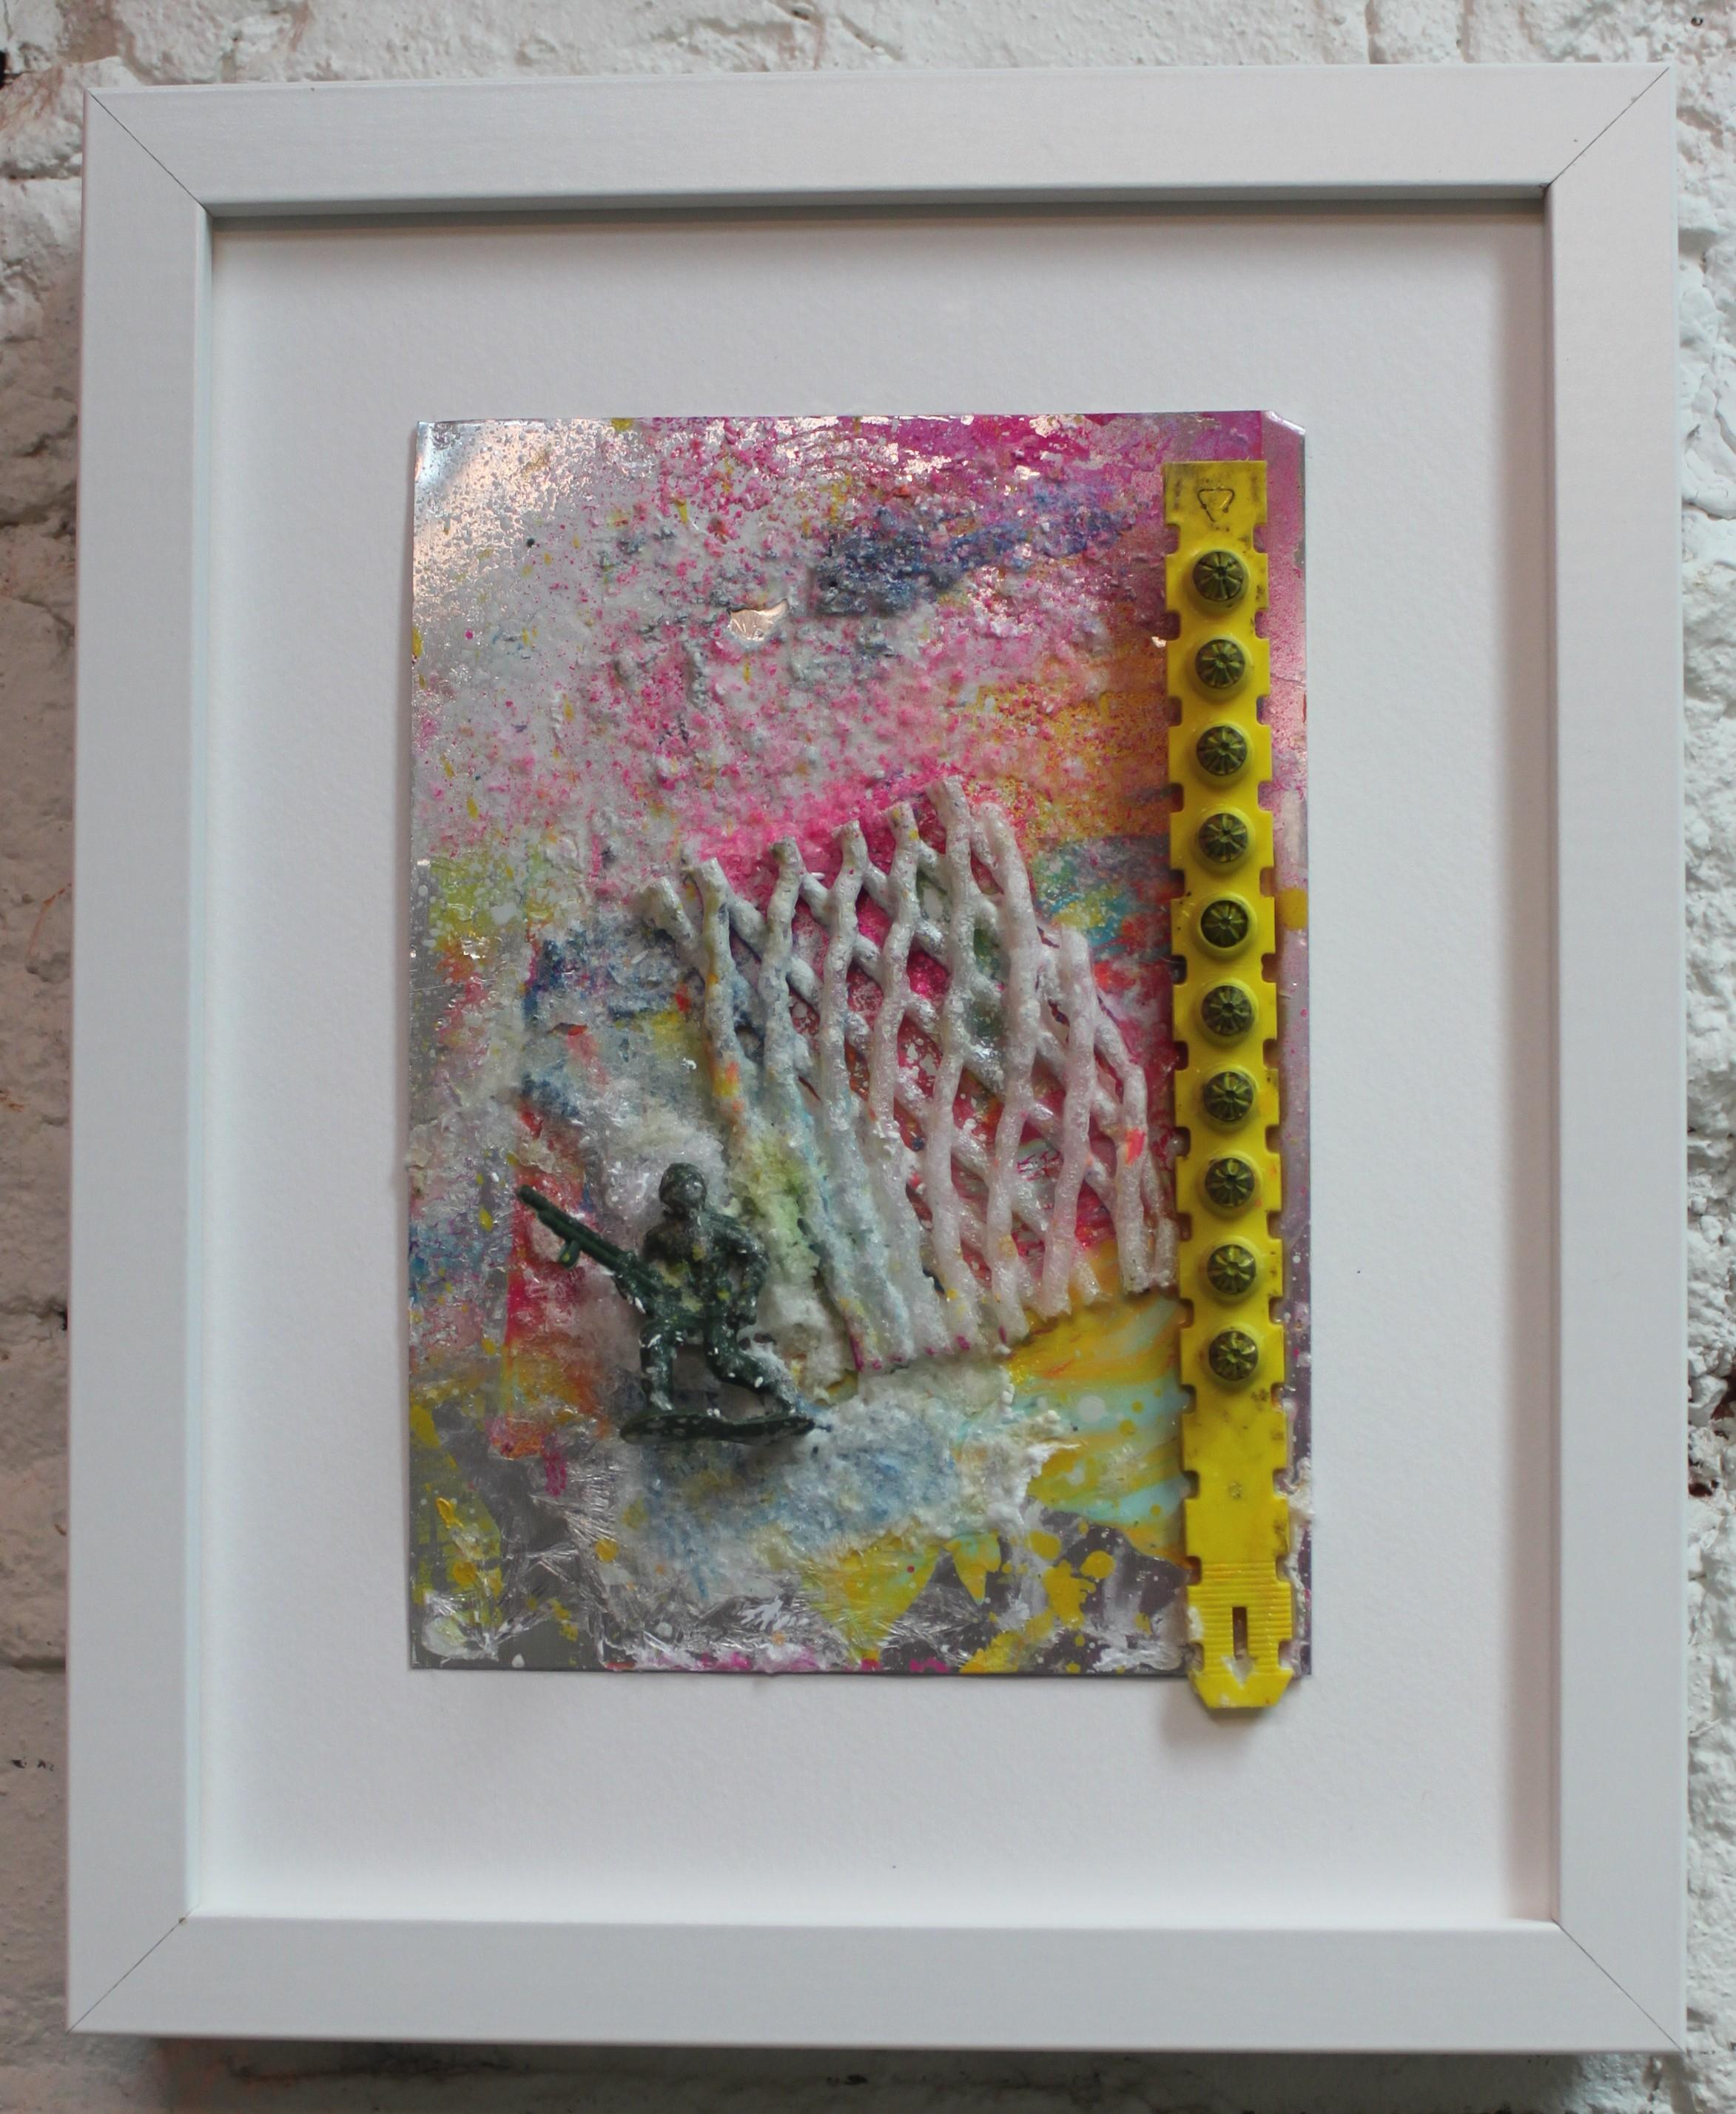 MiriamJuliannaSutton-Untitled-mixedmedia-9x11-2019-$150.JPG